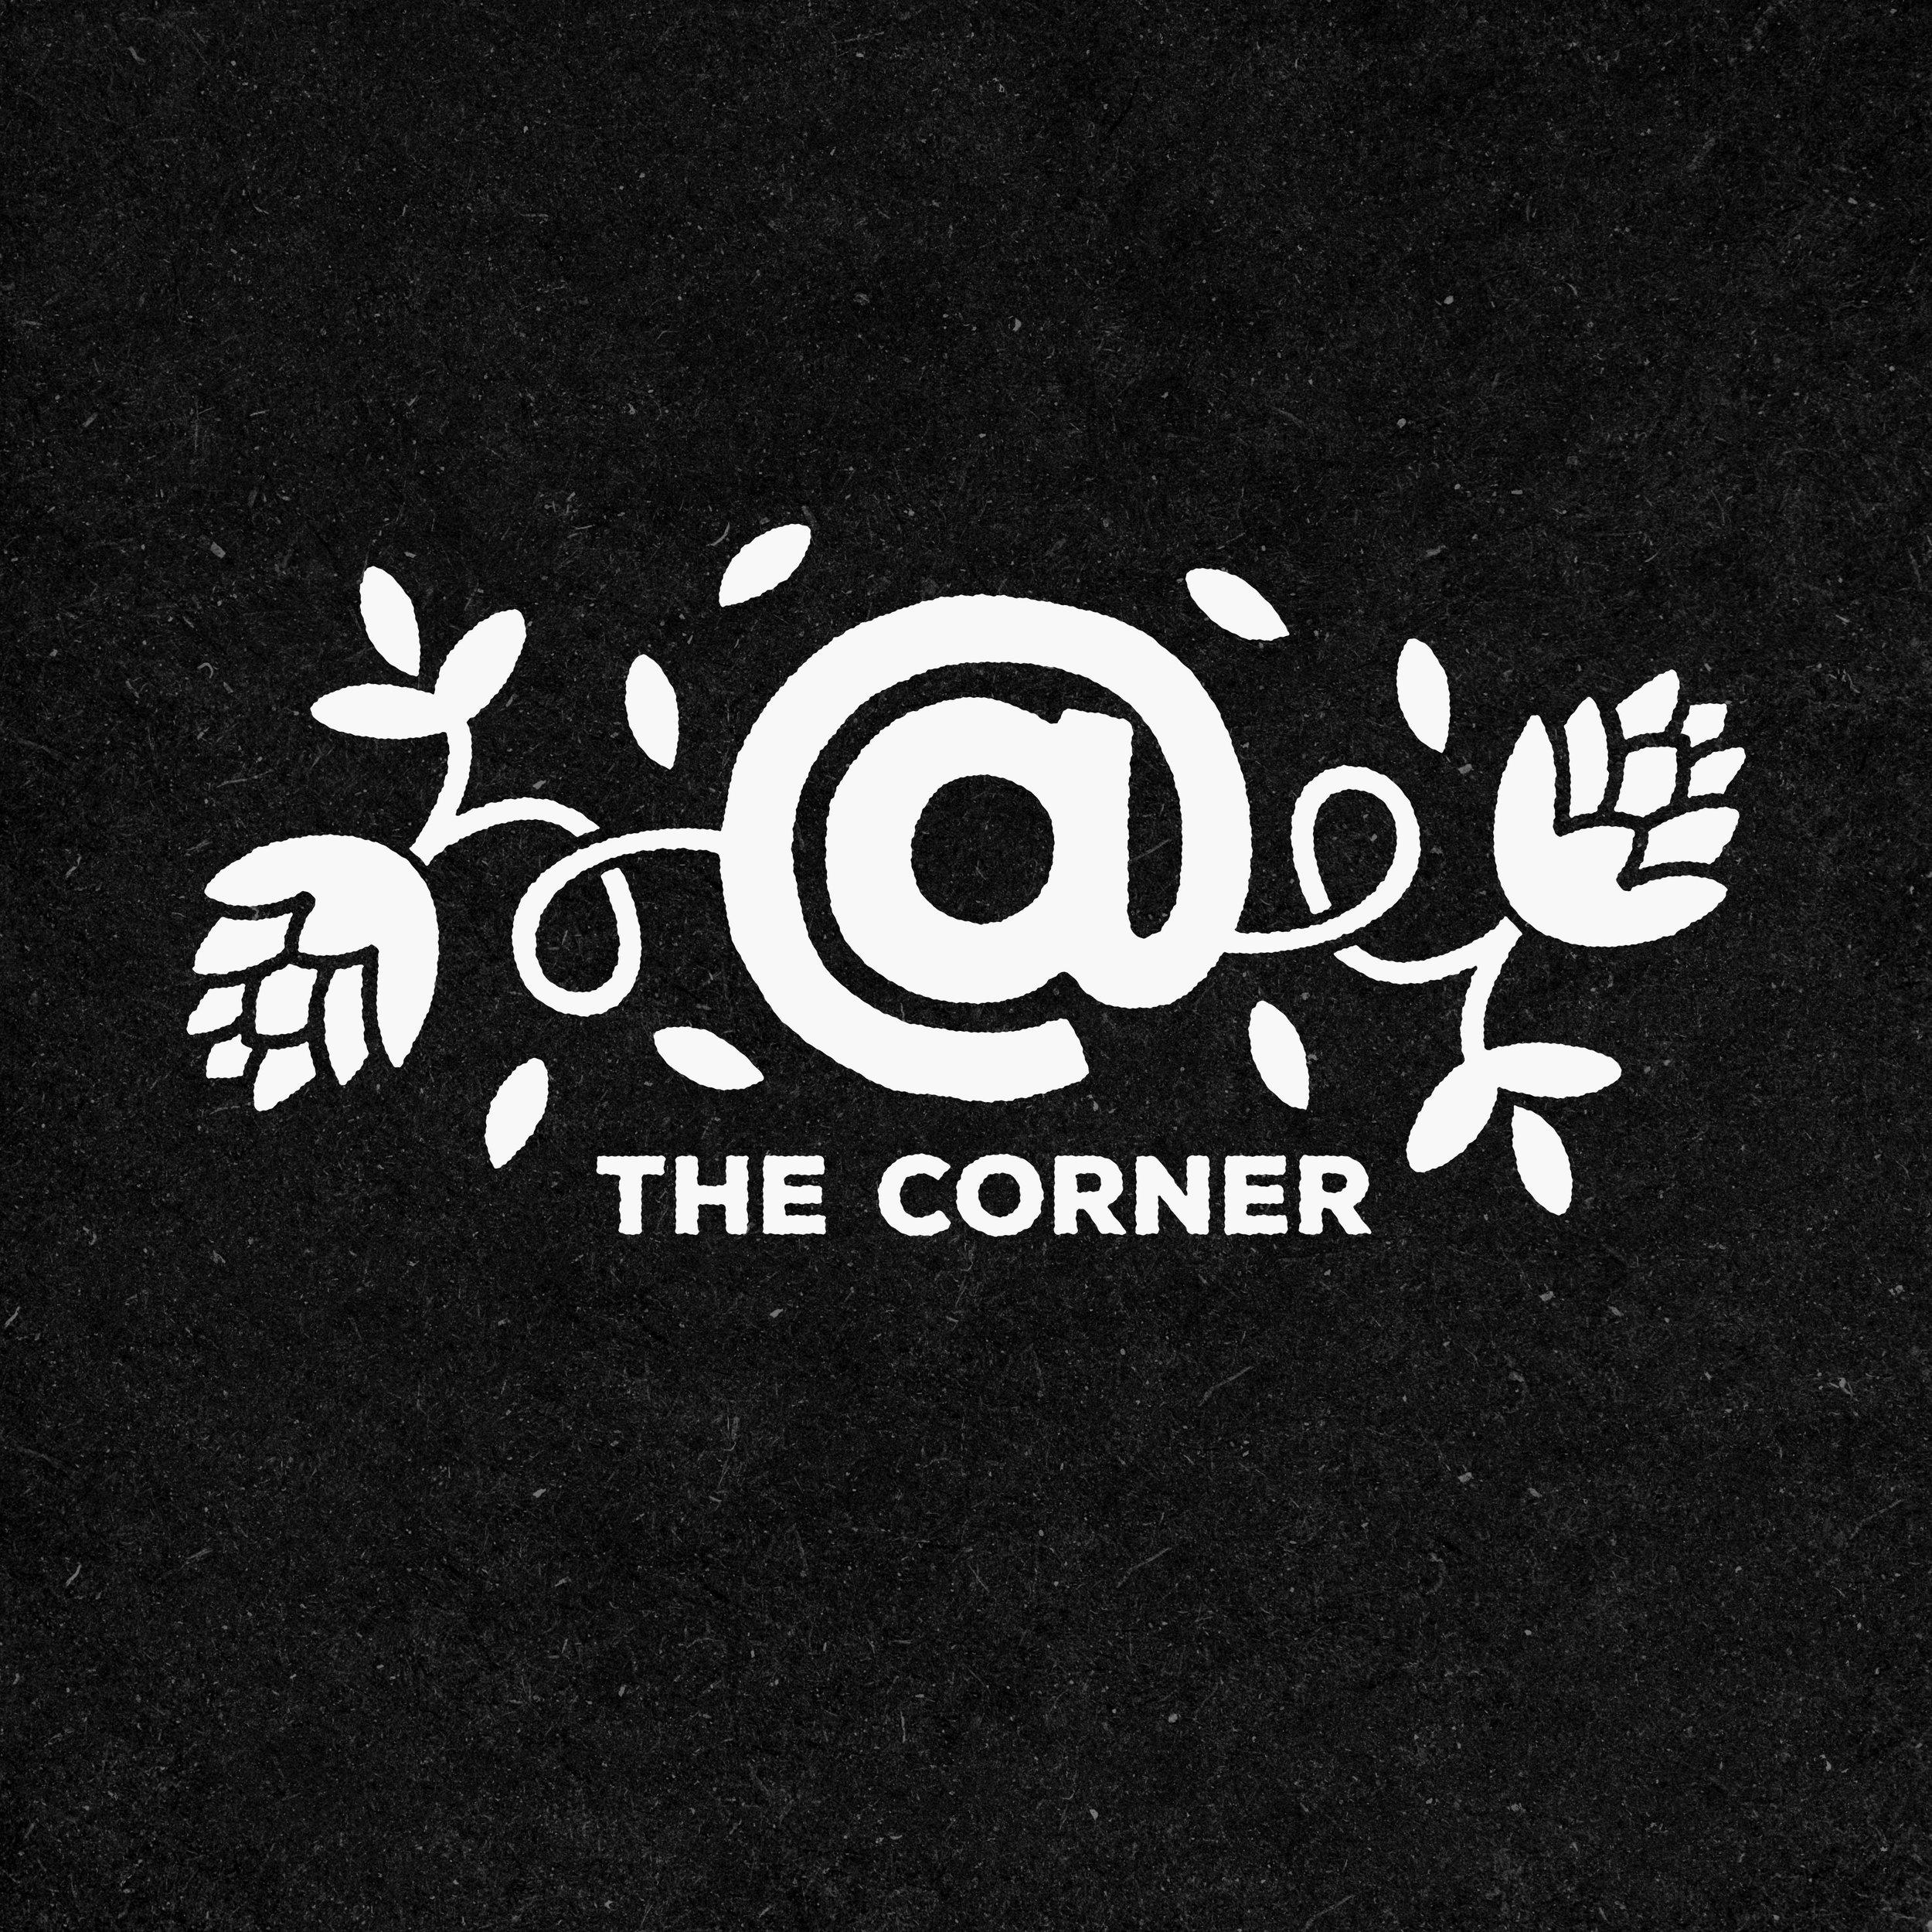 @ the corner - Matchbook-Print-Machine.jpg